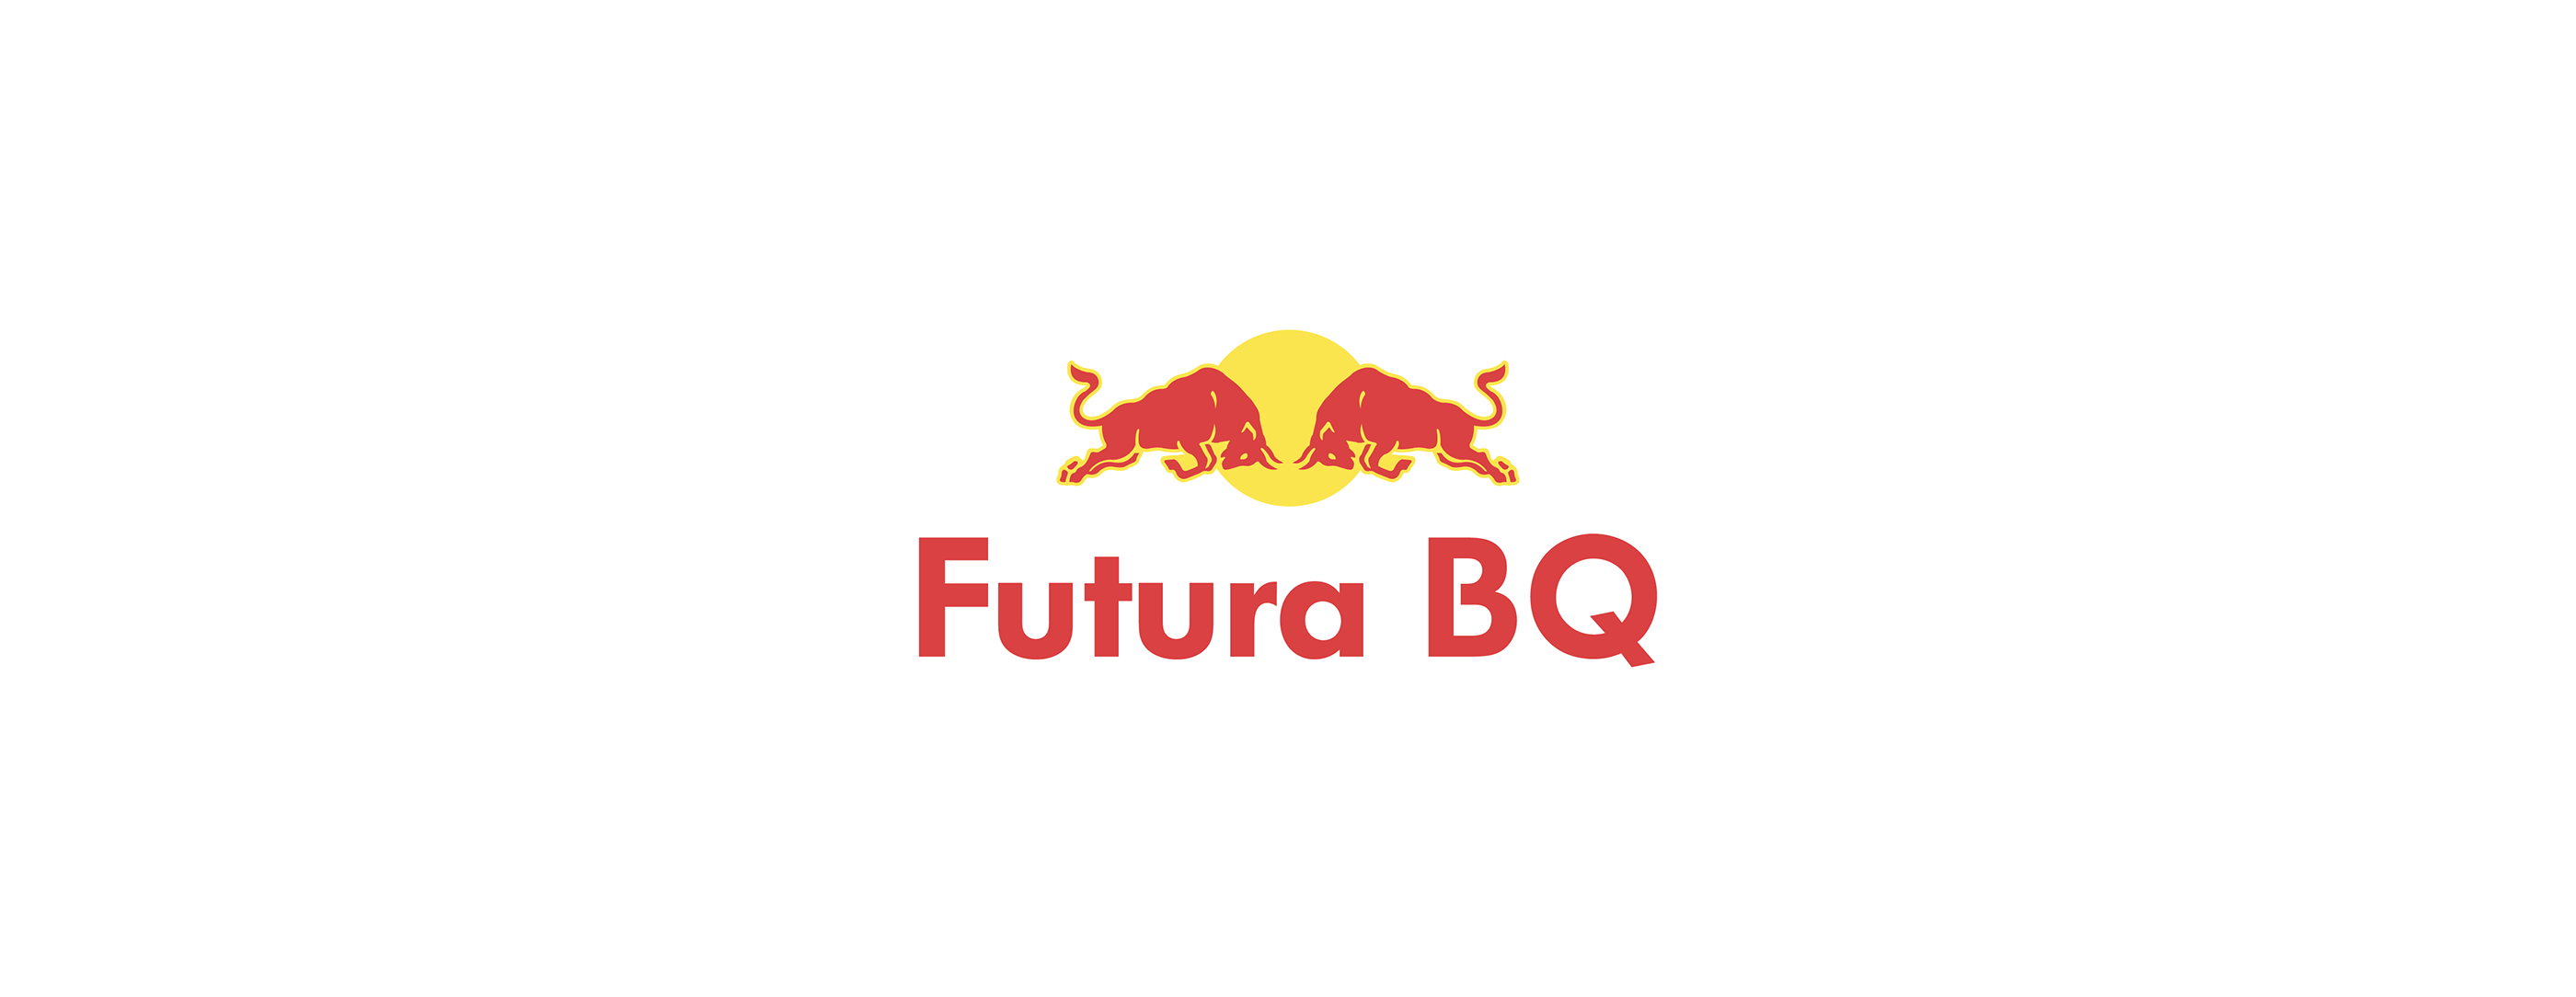 wersm-logo-font-redbull-futuraBQ